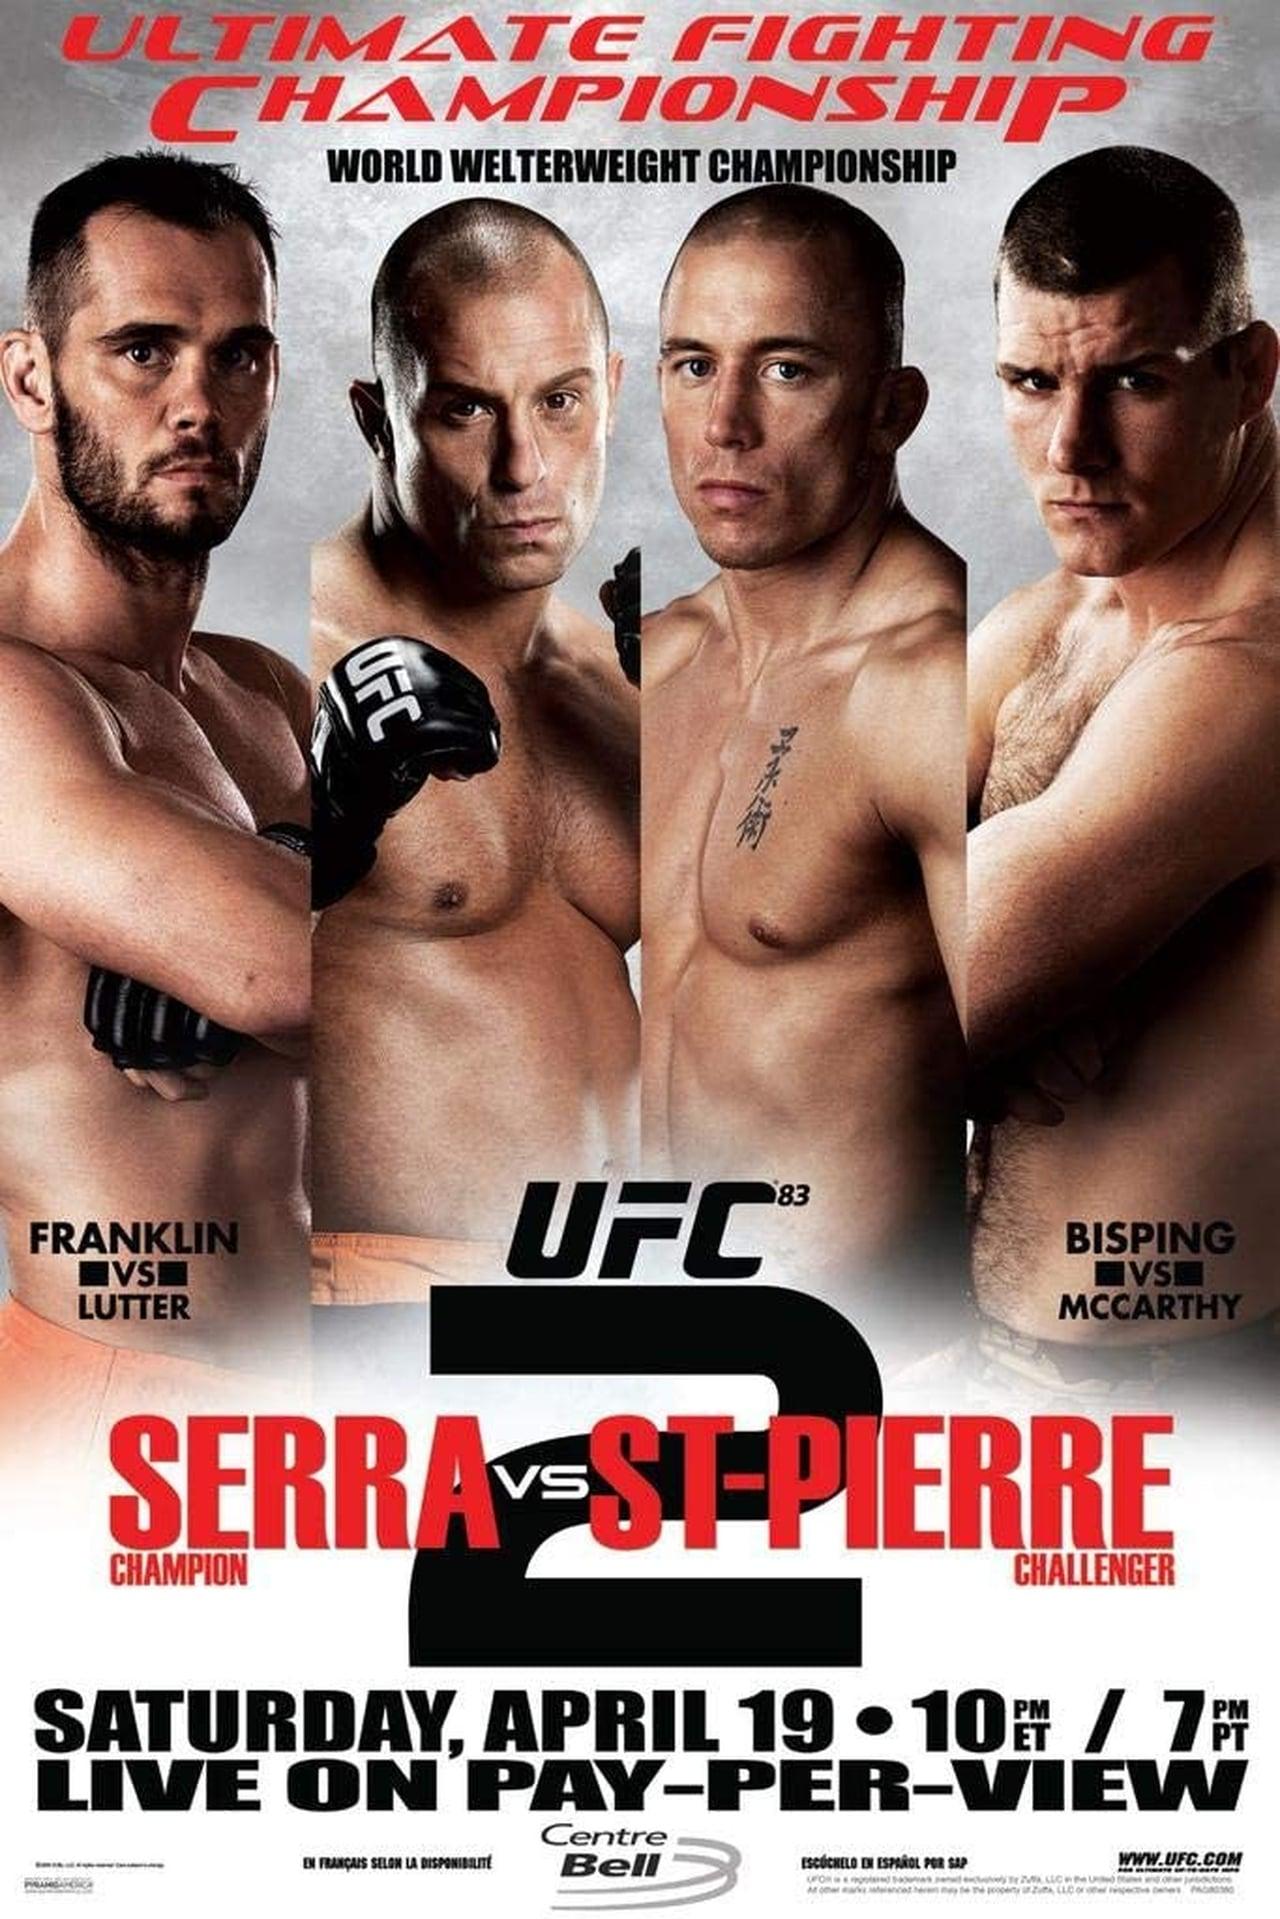 UFC 83: Serra vs St-Pierre 2